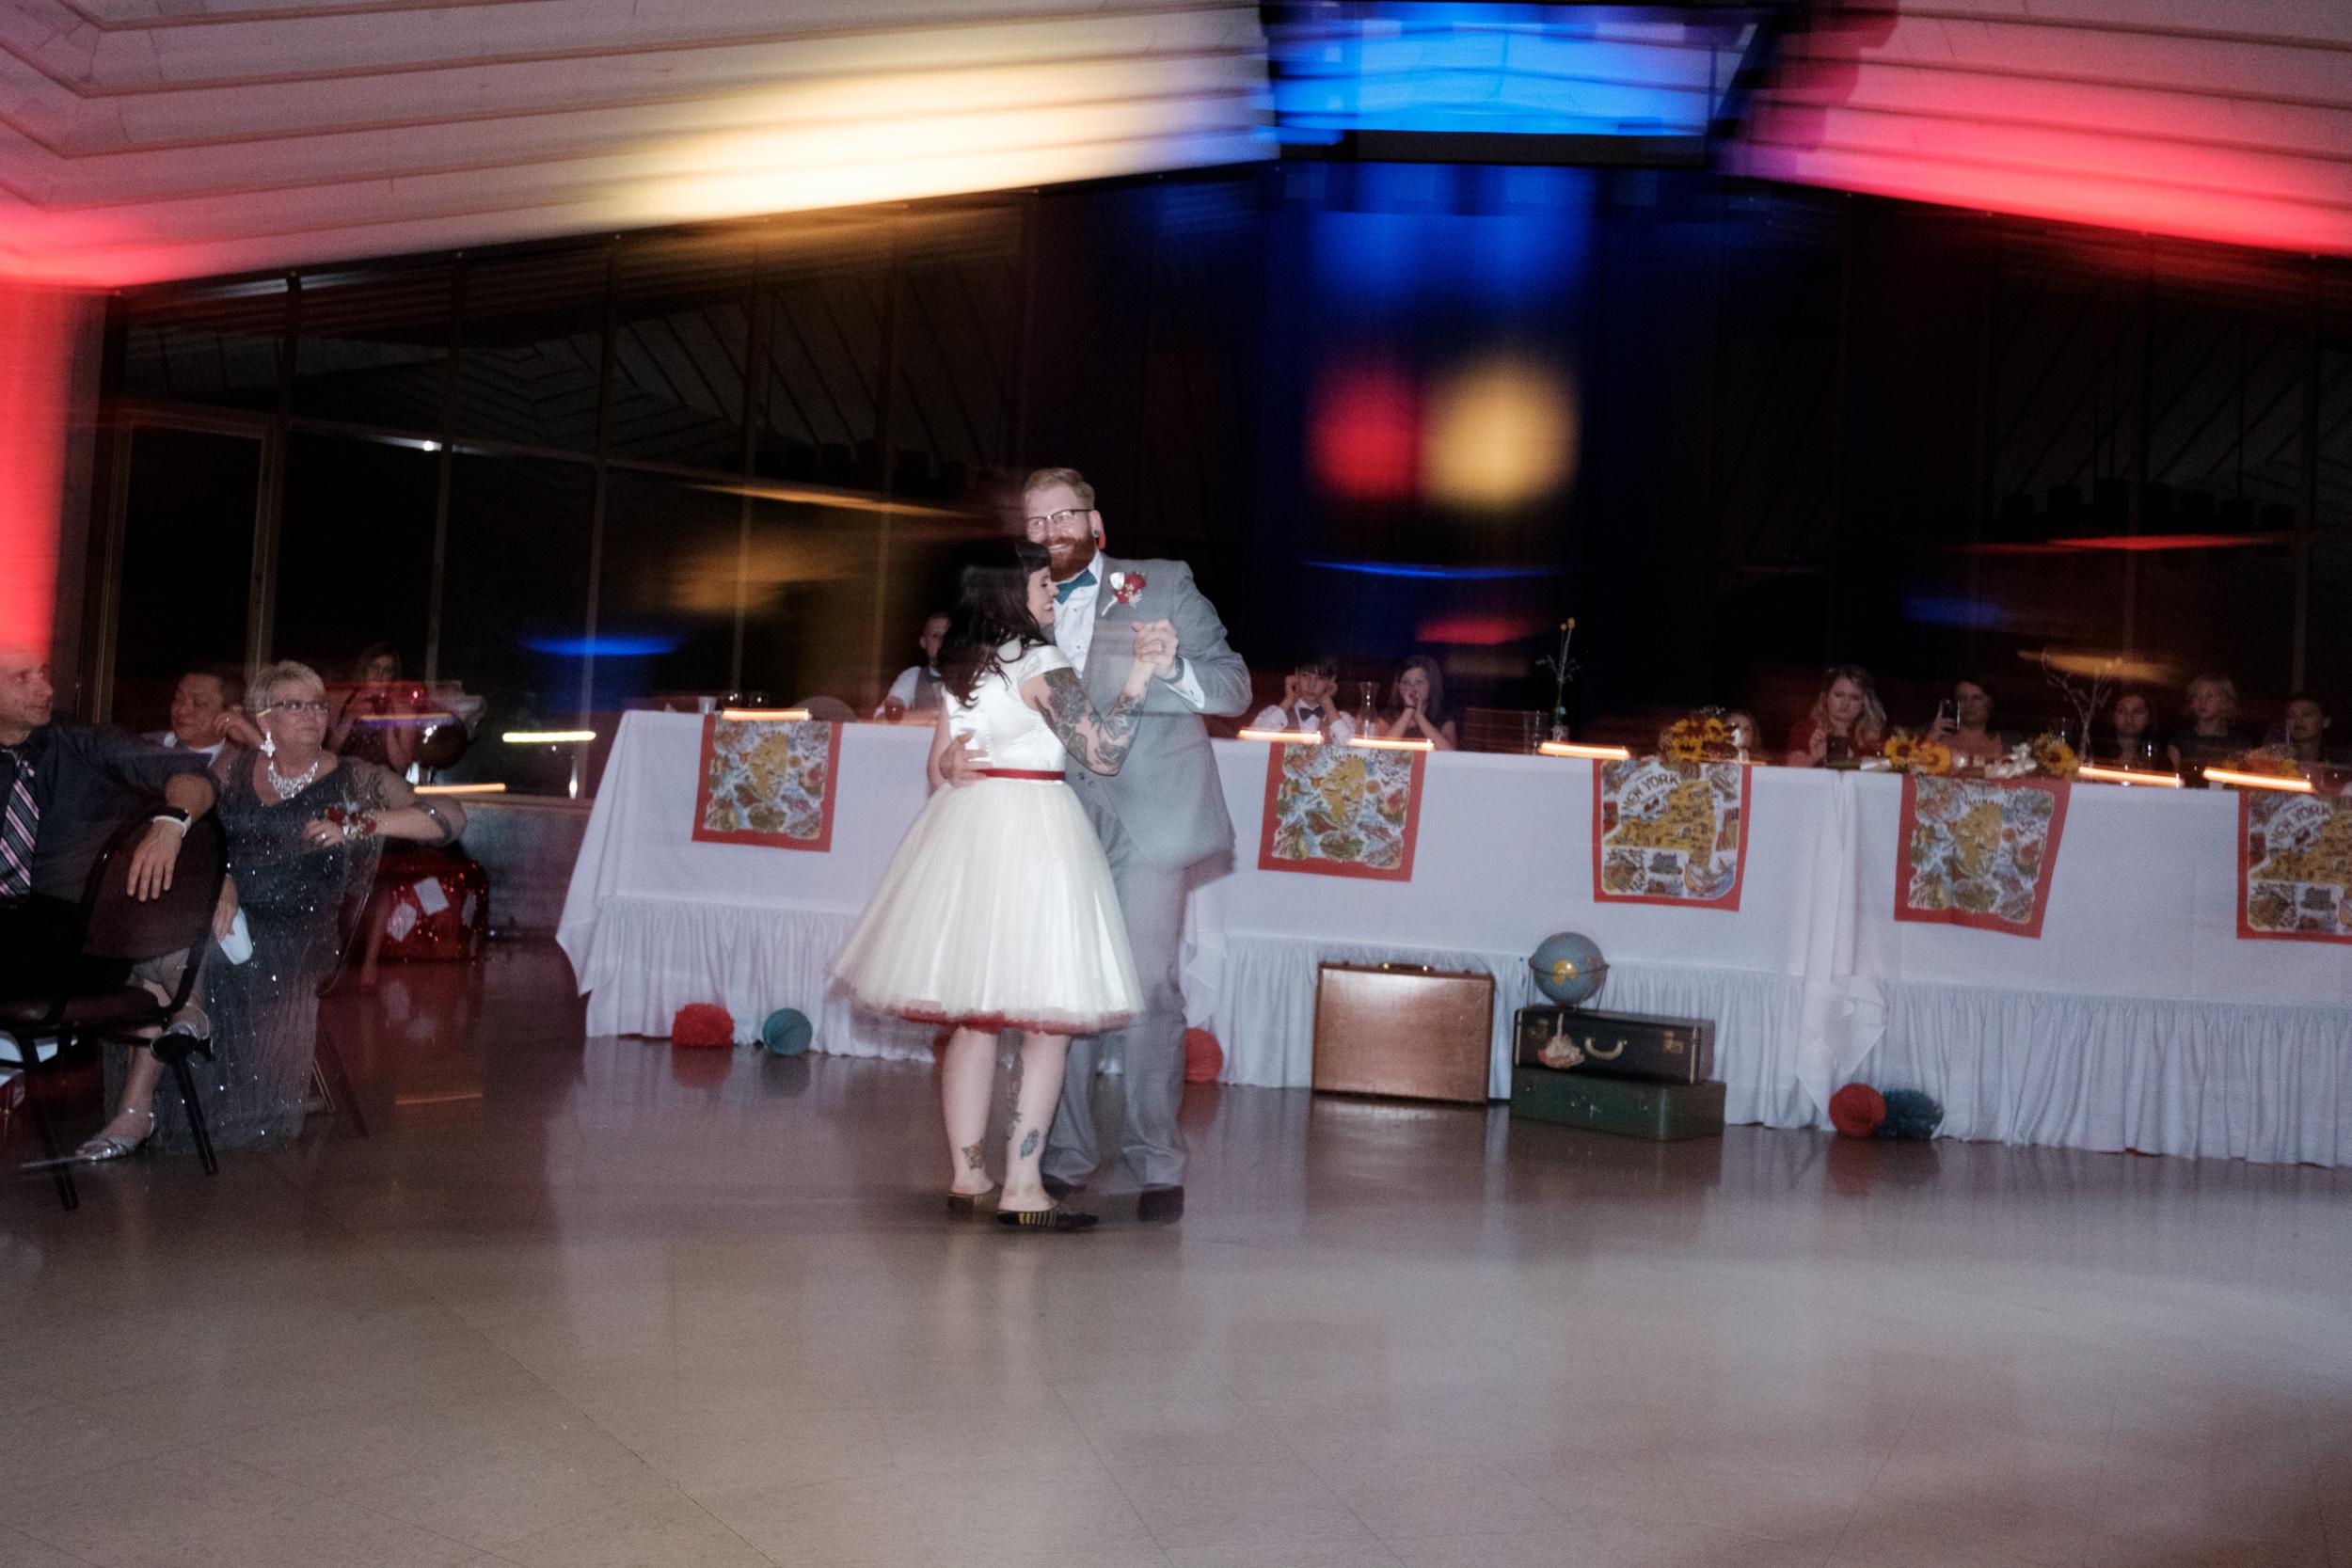 Christian & Sarah wedding photography by Brian milo-255.jpg